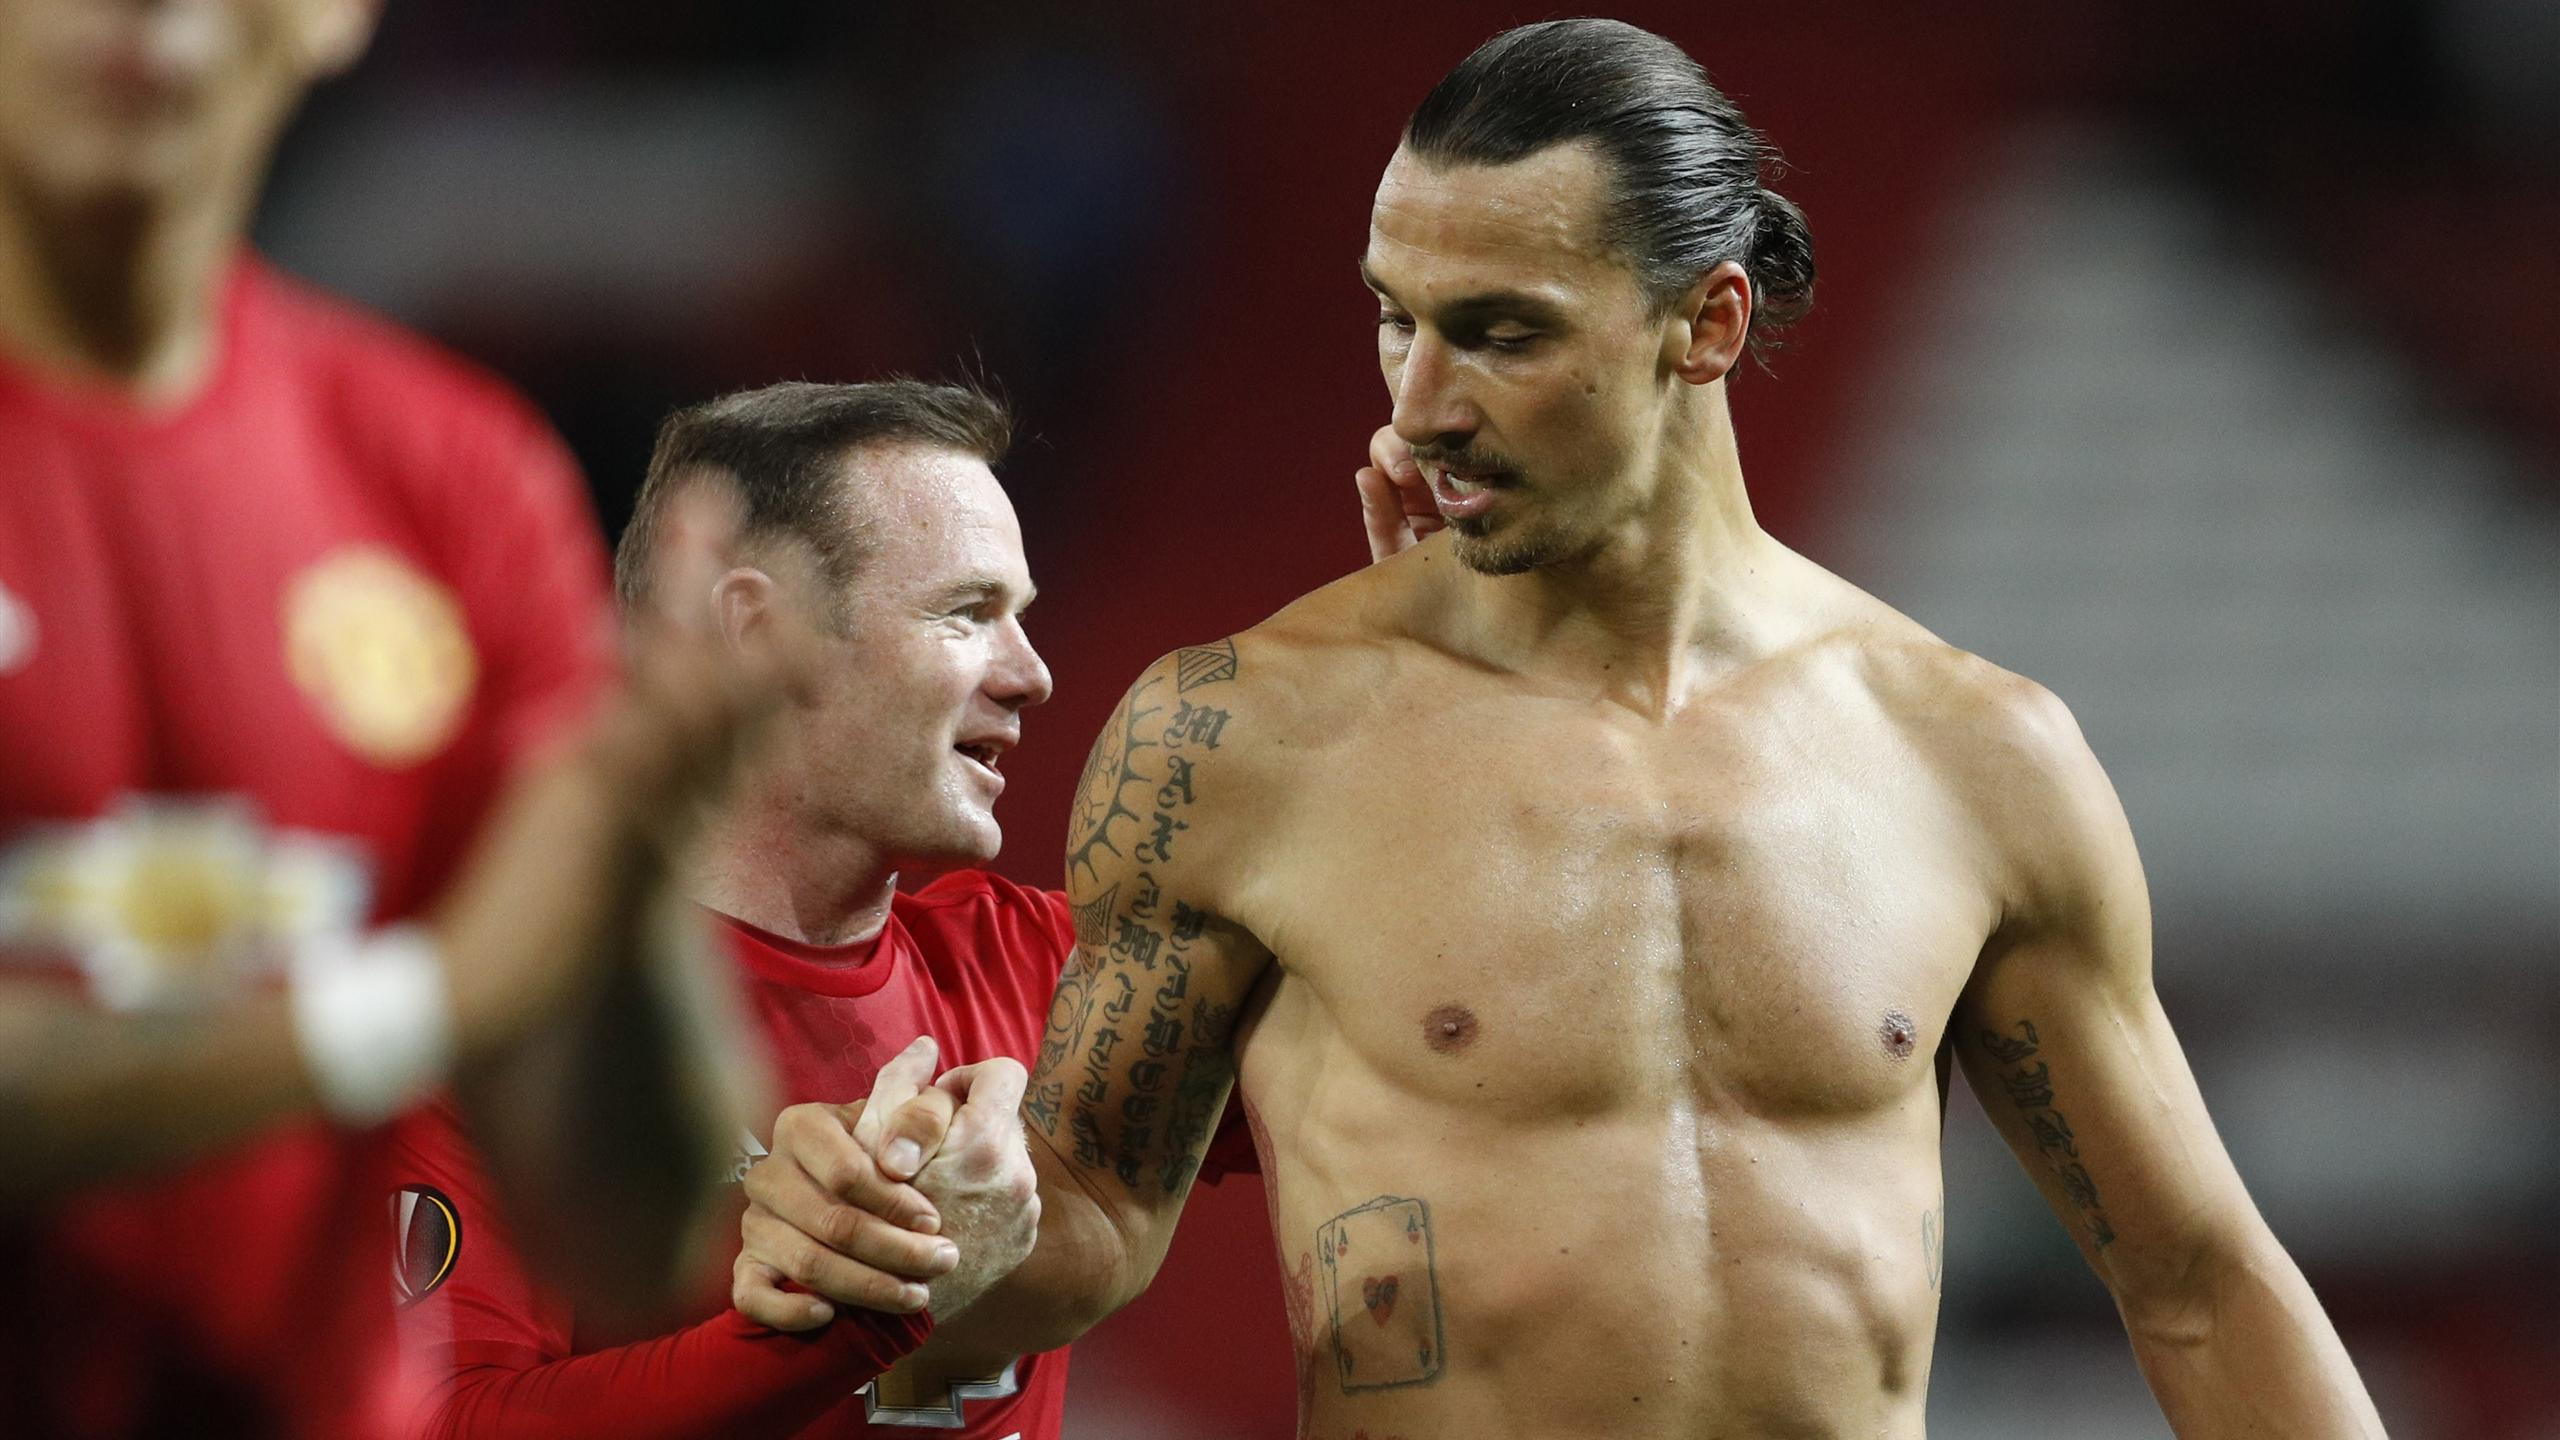 Manchester United's Wayne Rooney and Zlatan Ibrahimovic